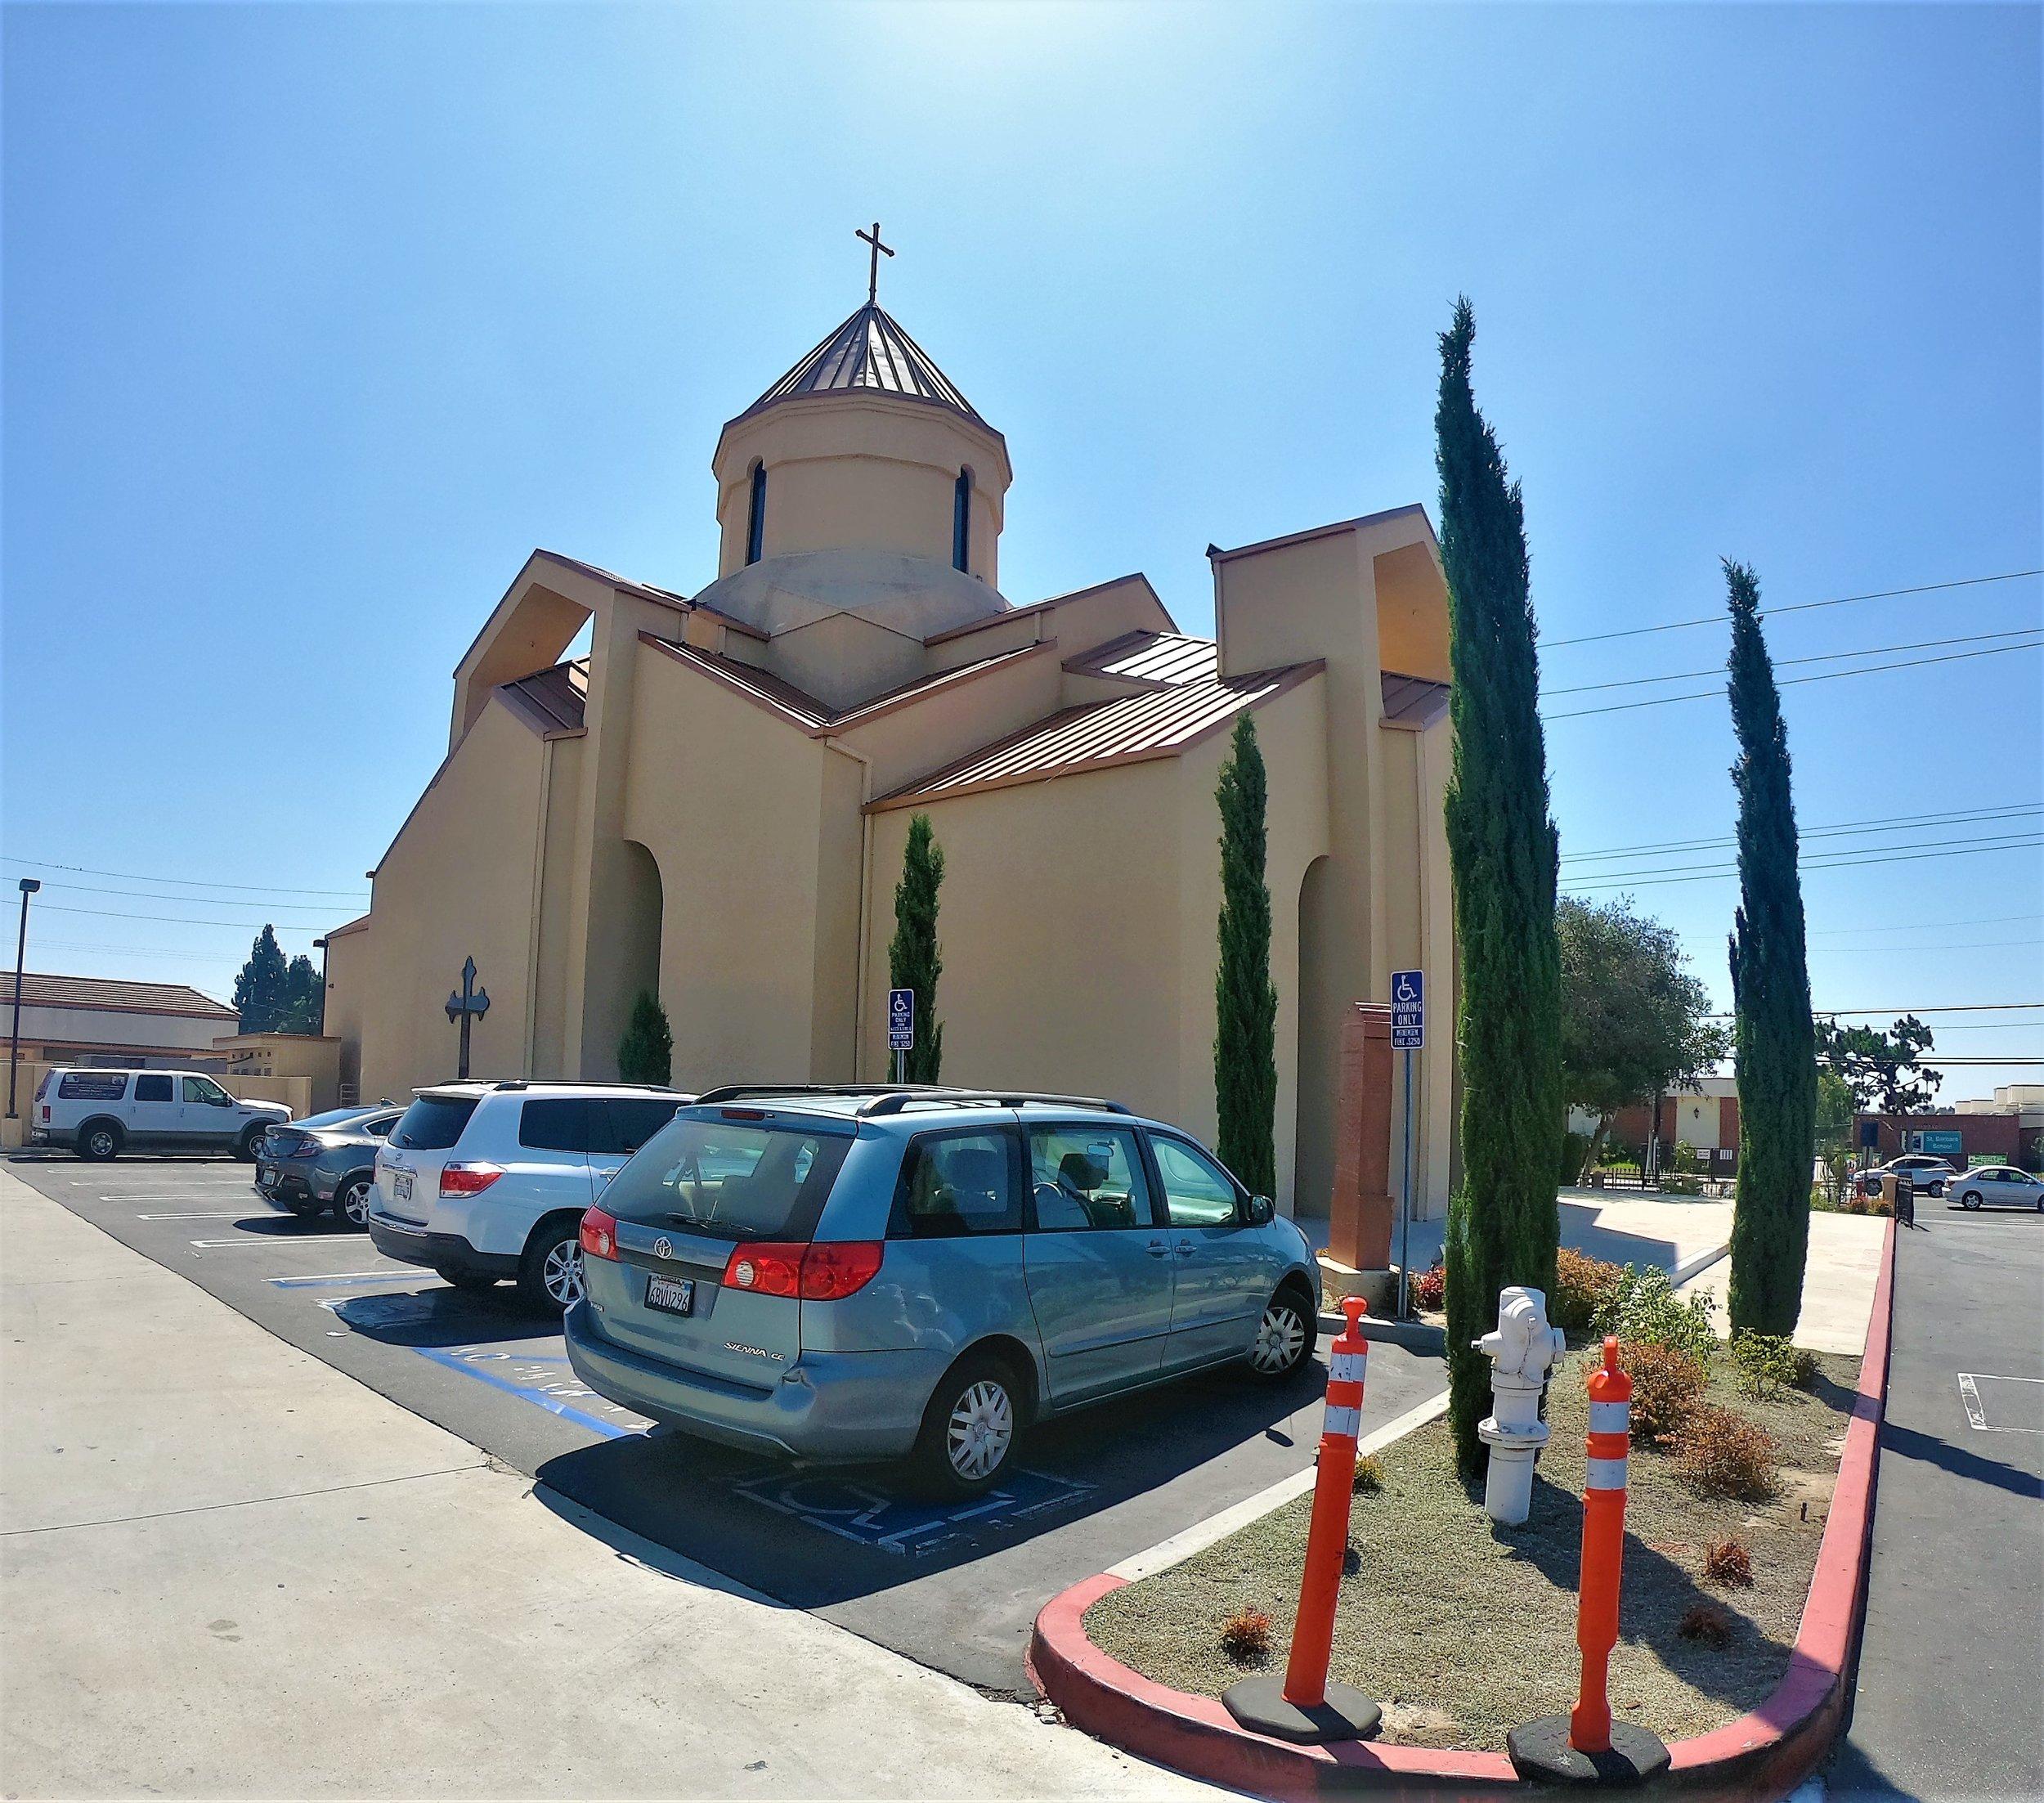 Forty Martyrs Armenian Church in Santa Ana, California